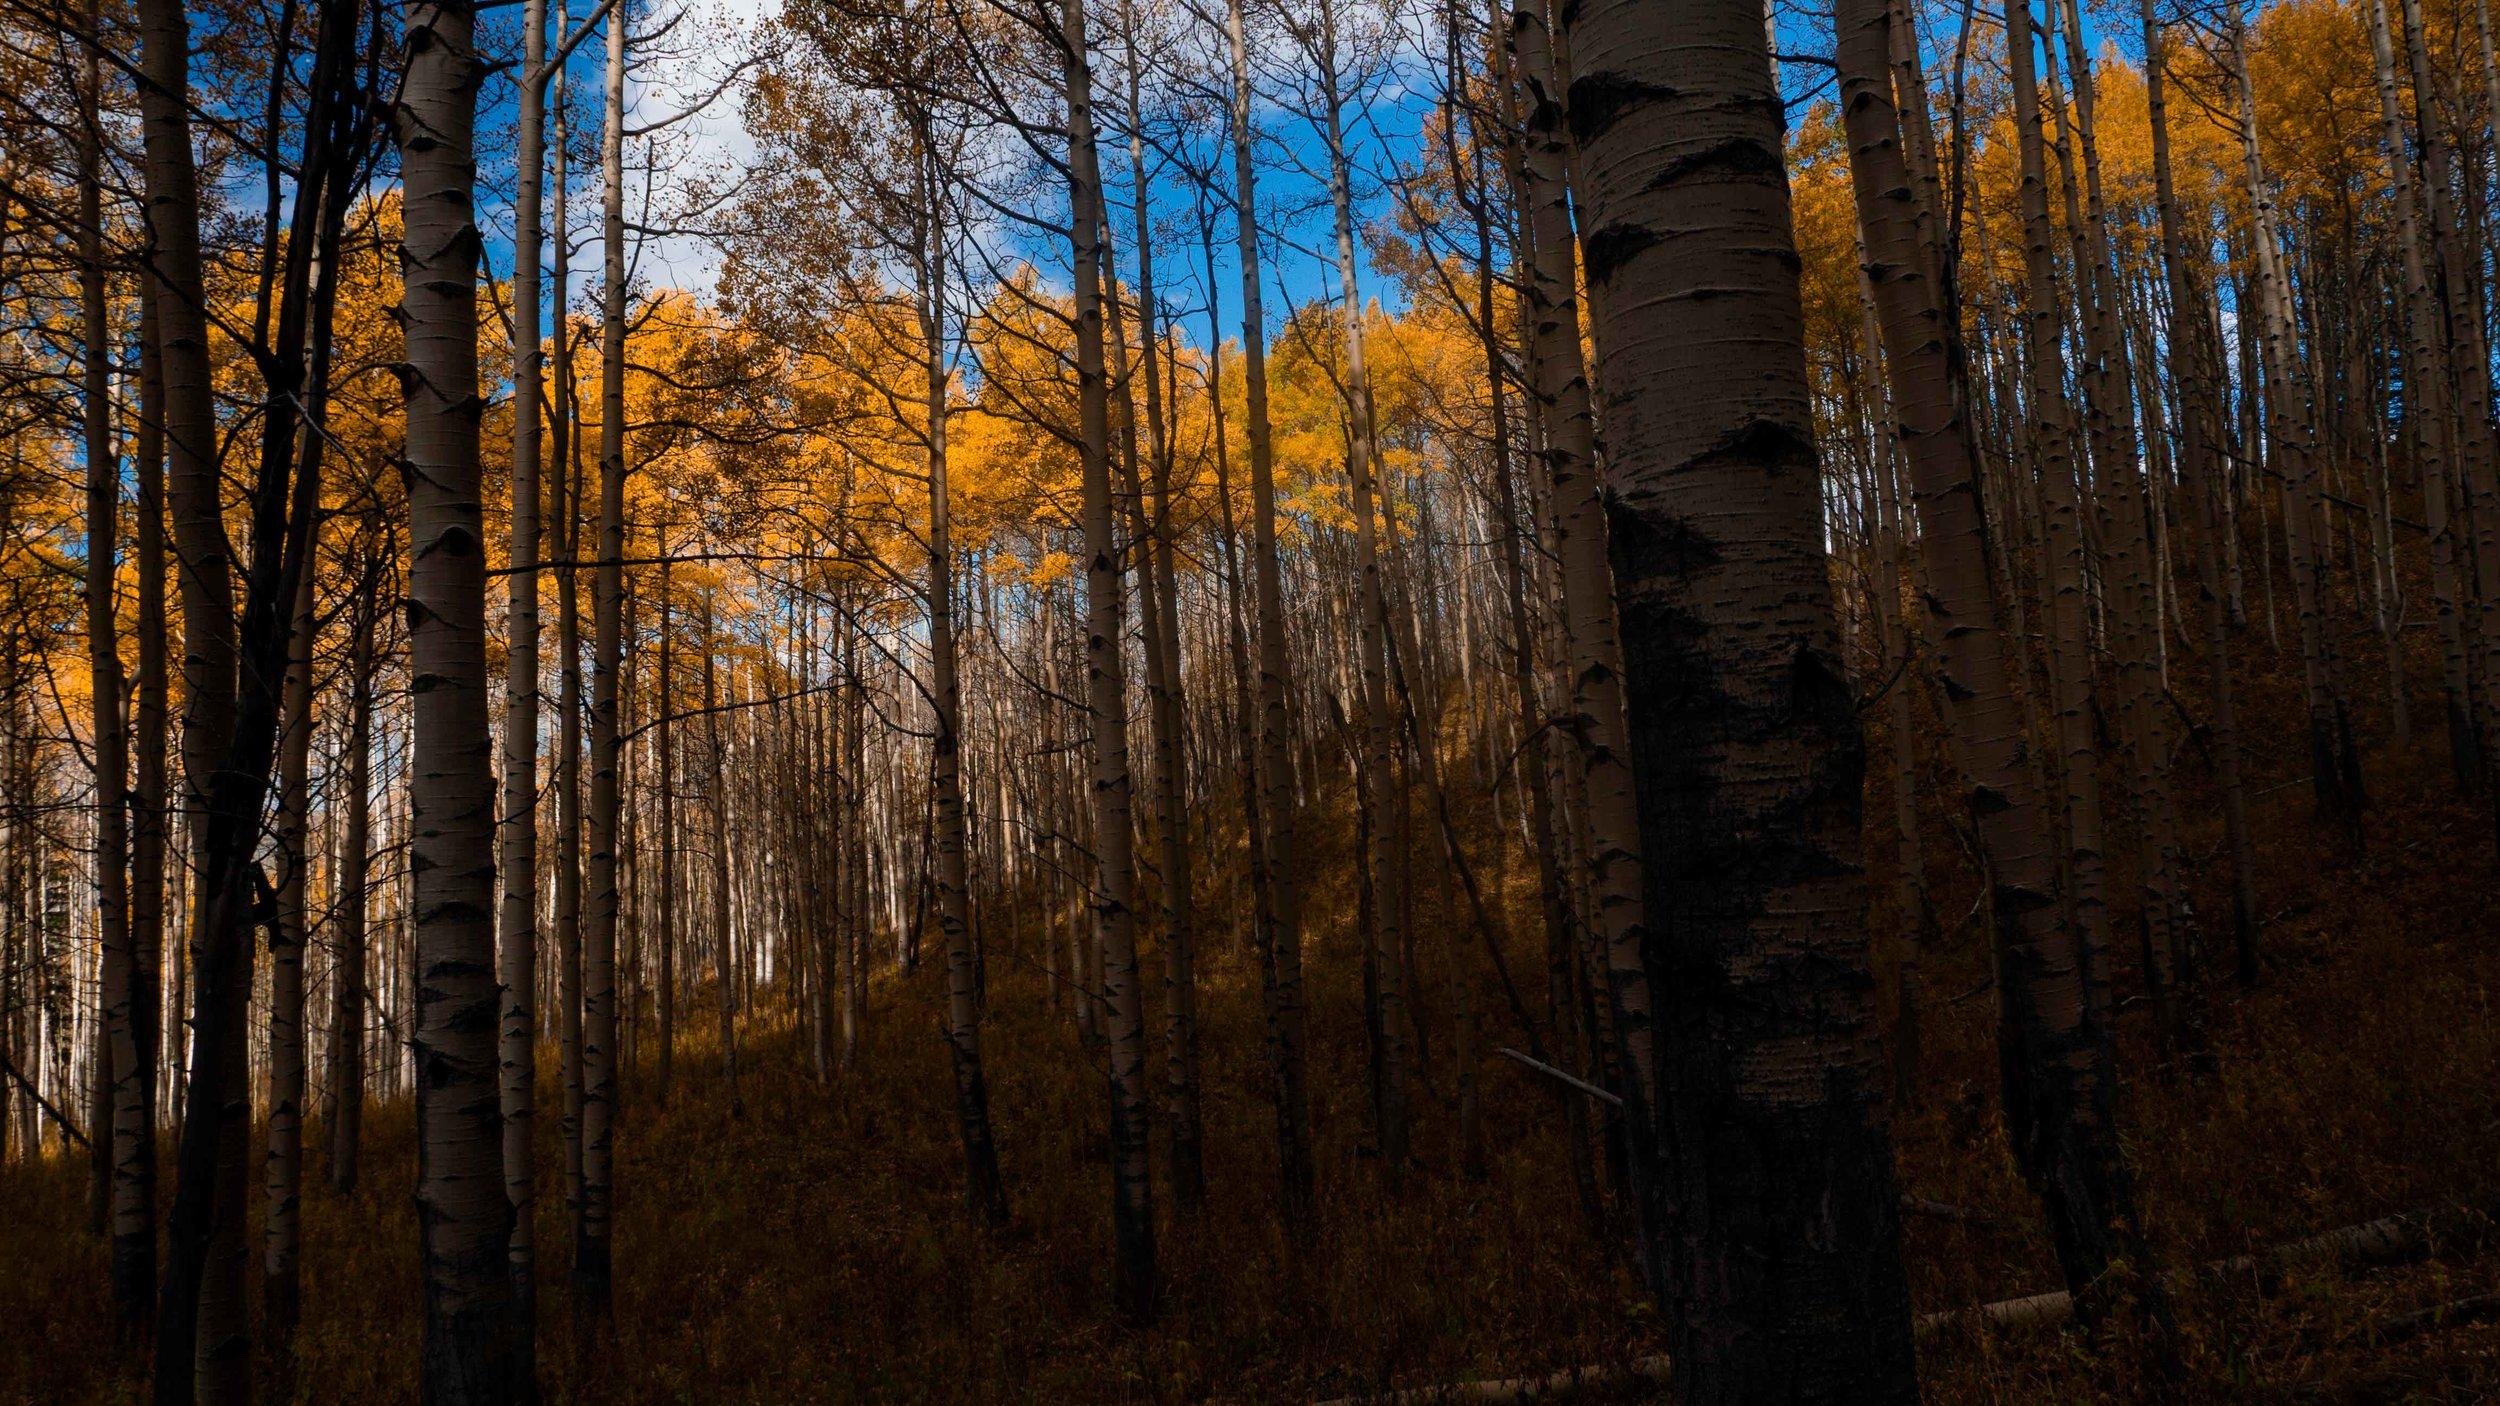 treesshadowto0029.jpg